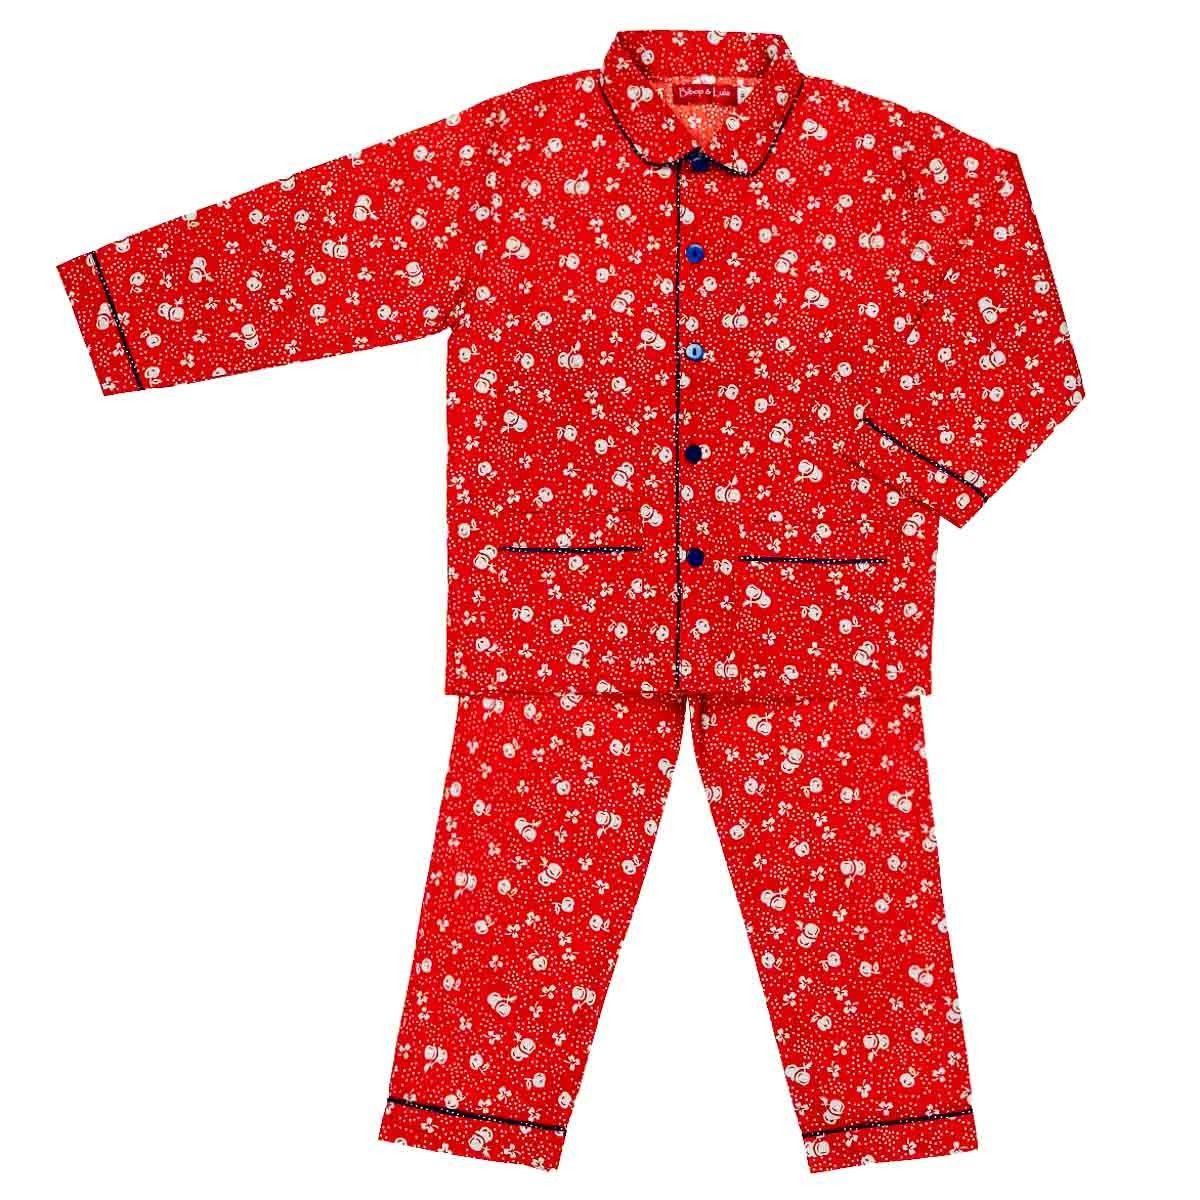 Pyjama enfant coton rouge cerise